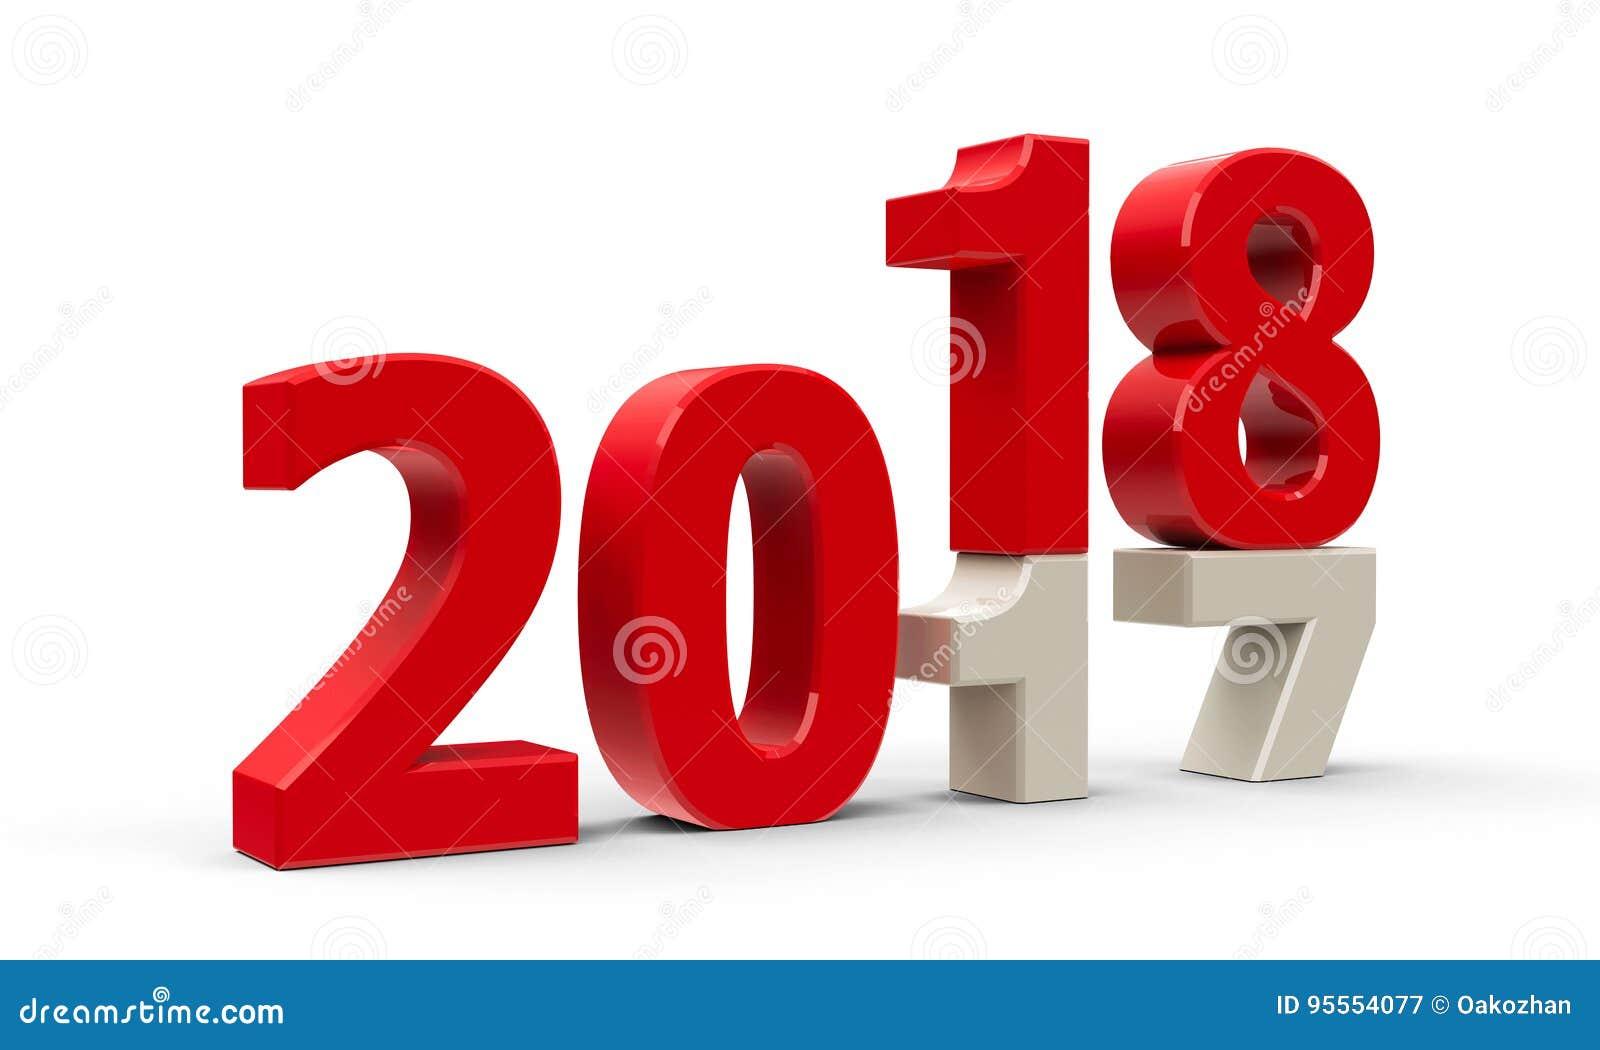 2017 2018 2